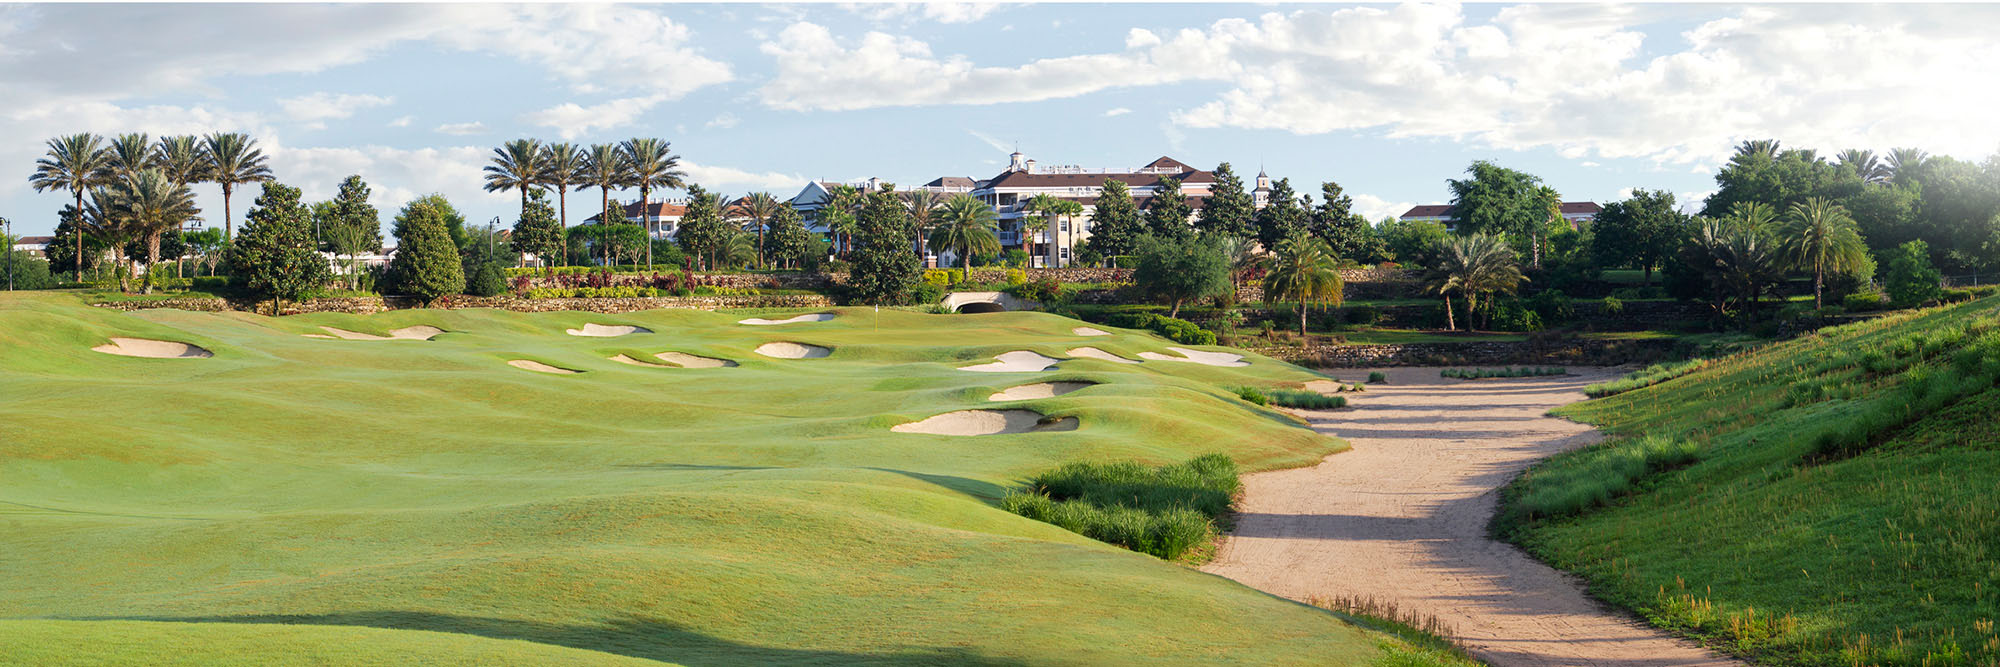 Golf Course Image - Reunion Resort Watson No. 14